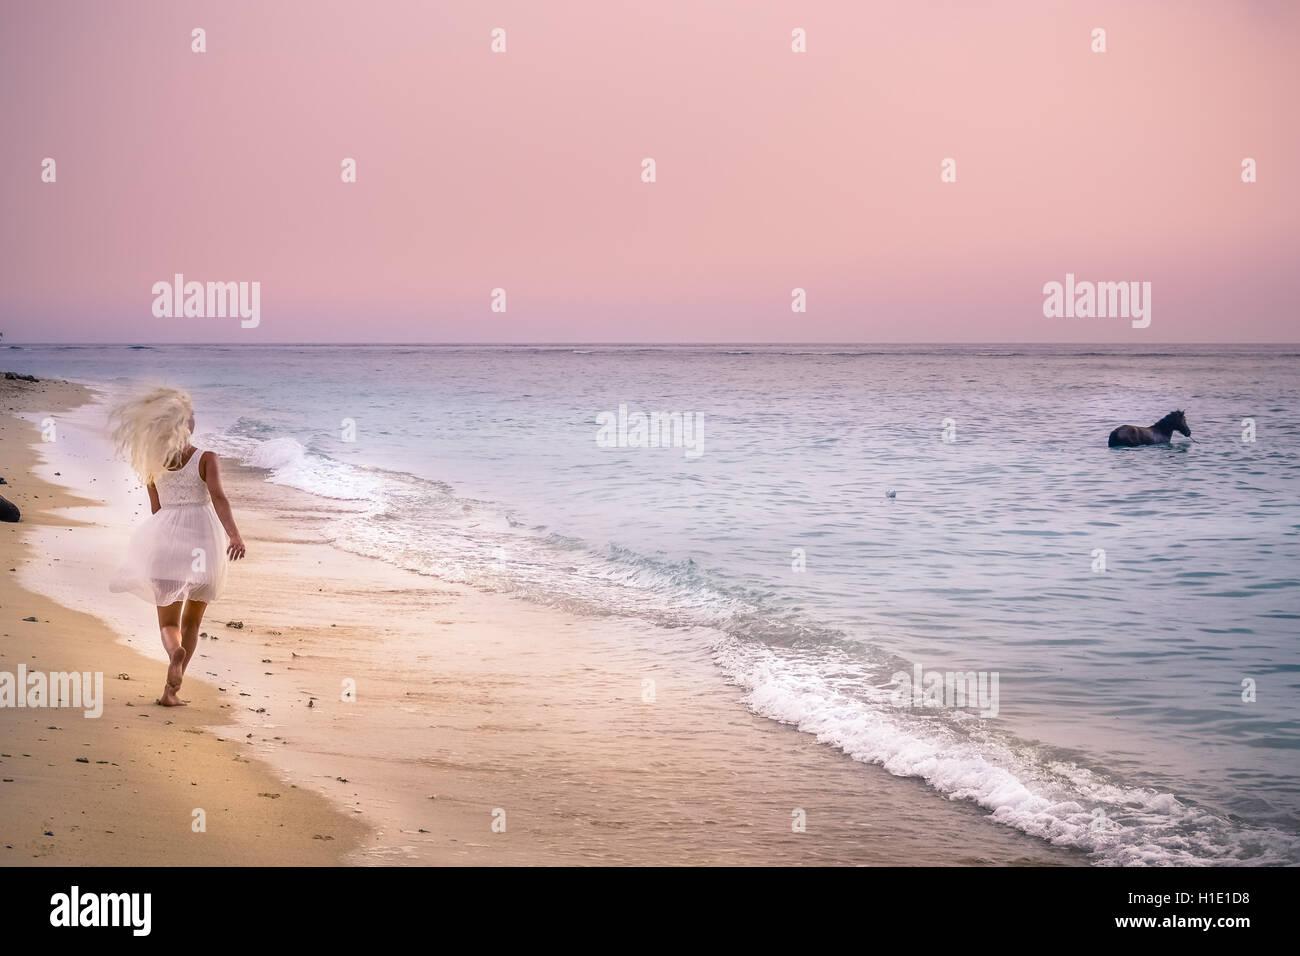 beach, running, horse, sunset, Gili, Bali, romanticwoman - Stock Image